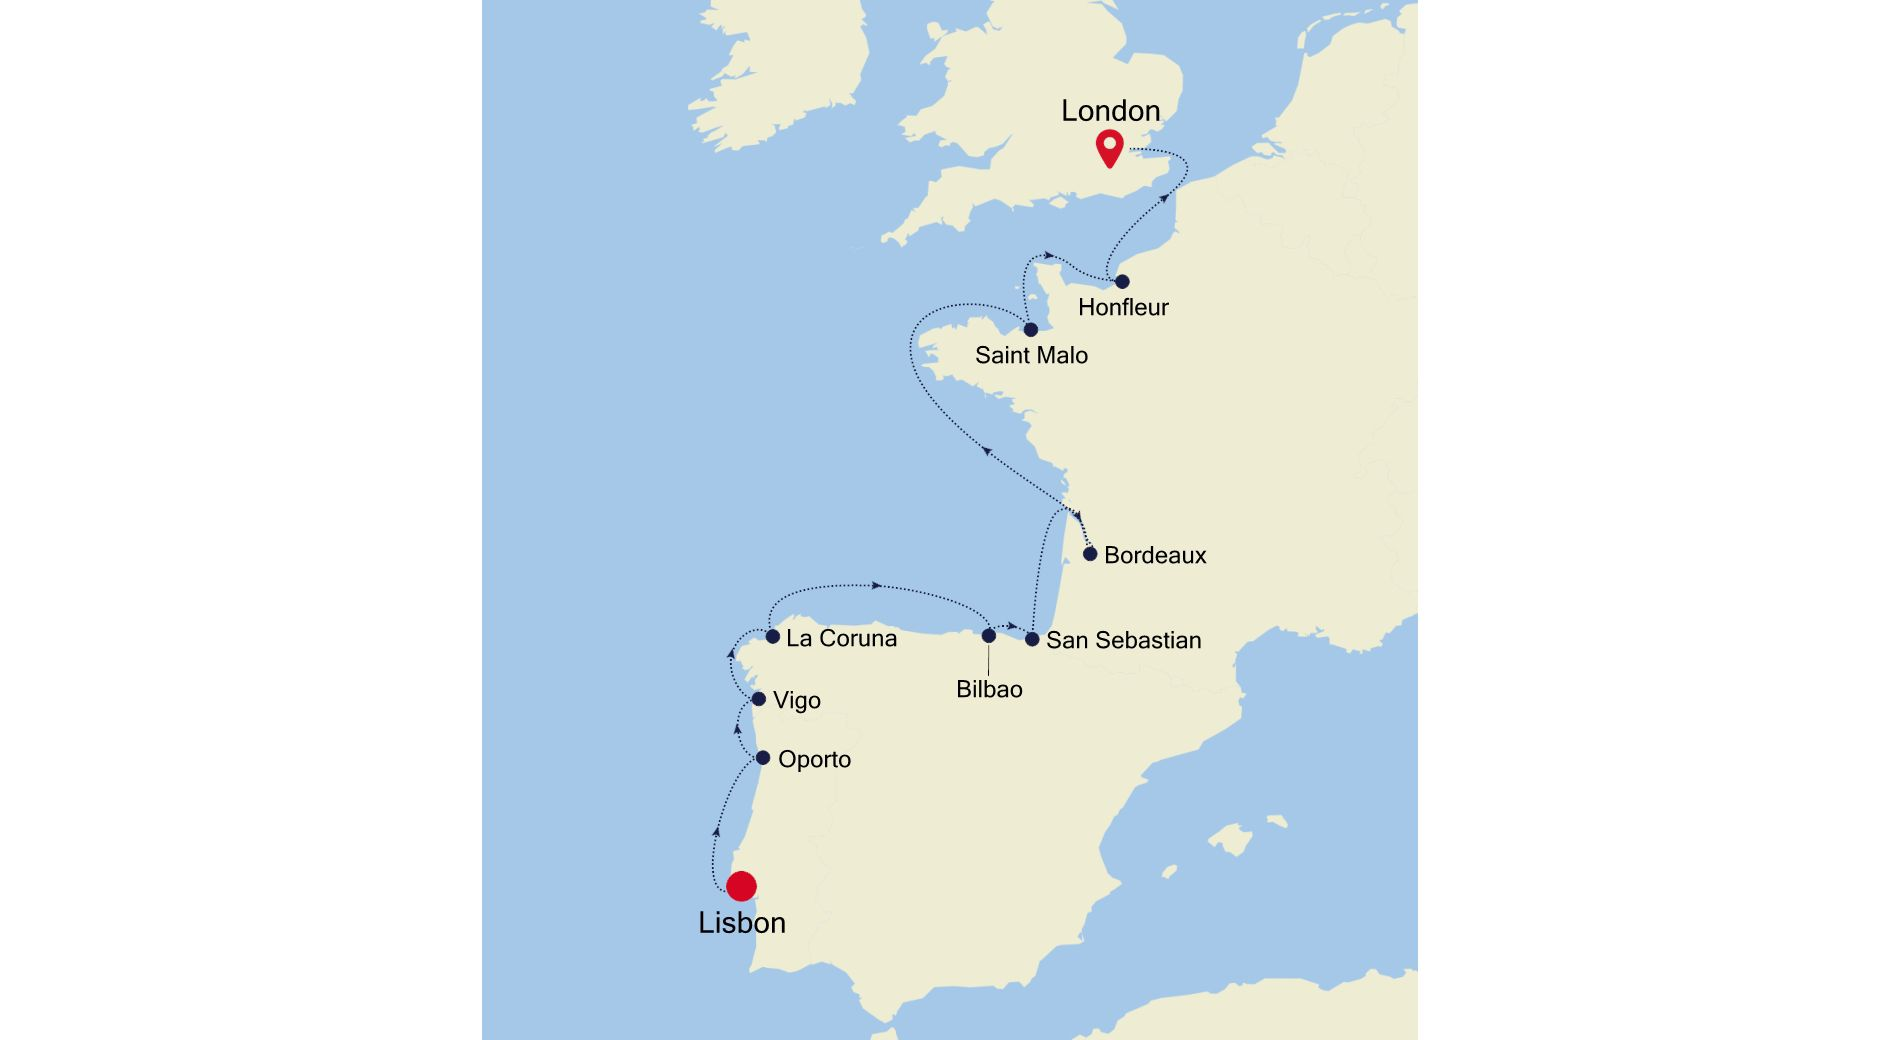 E4210505012 - Lisbon nach London